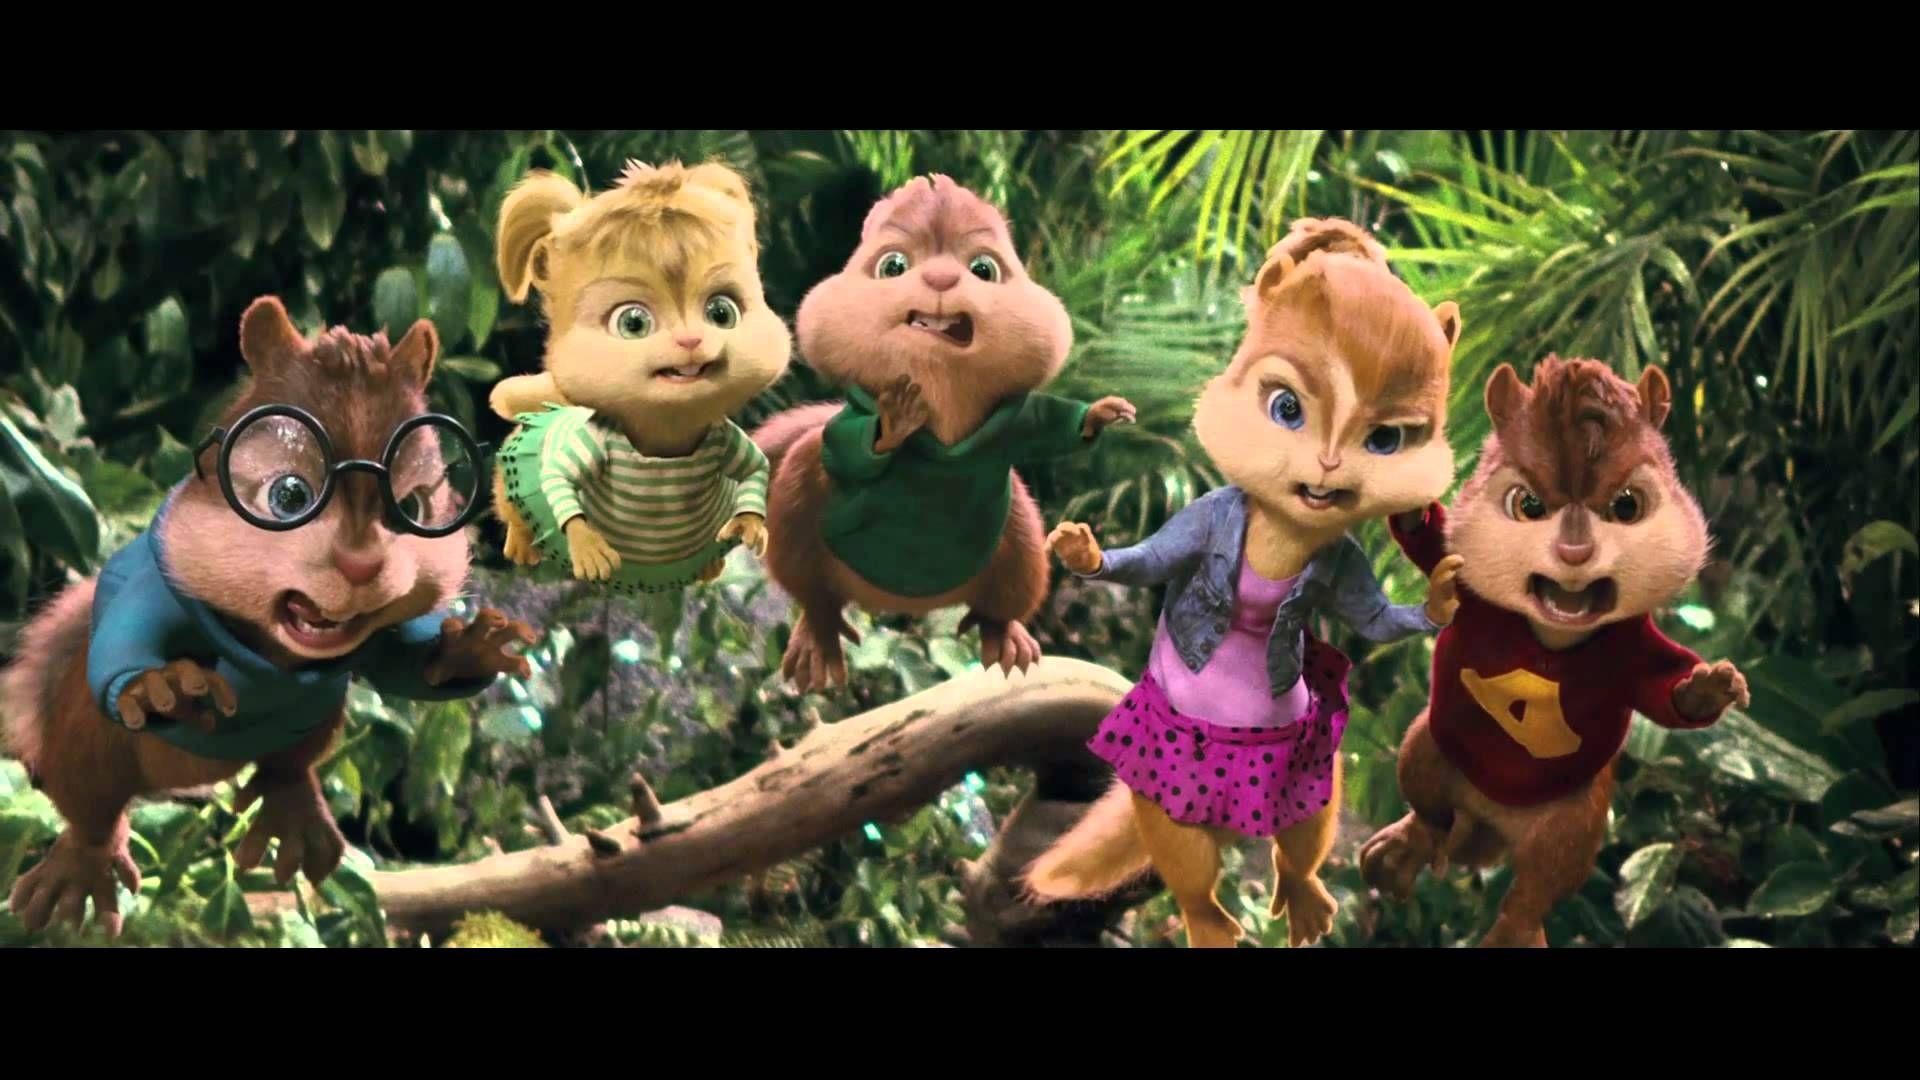 Alvin E Os Esquilos 3 Trailer Oficial Dublado 2 Alvin E Os